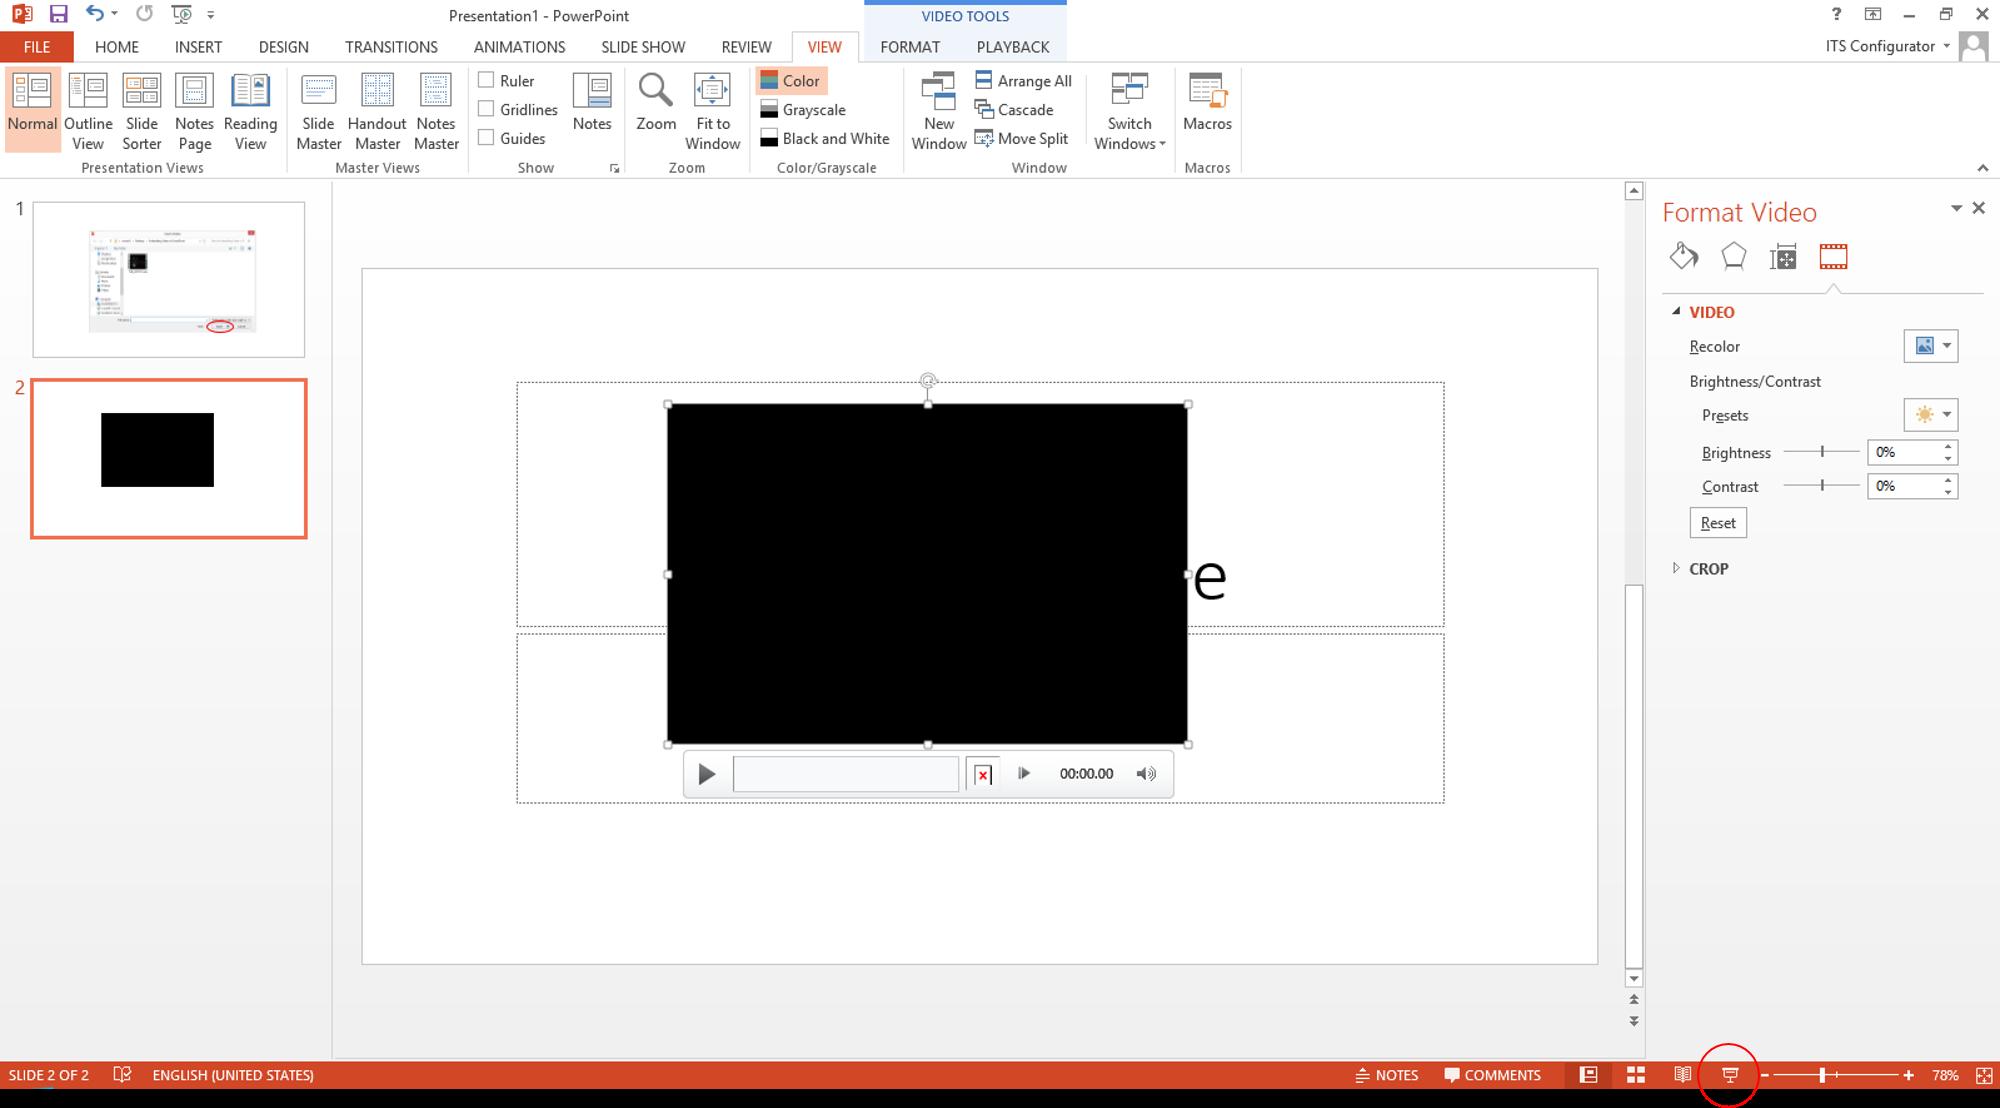 Resource Center - Embedding Video in PowerPoint on Windows 8